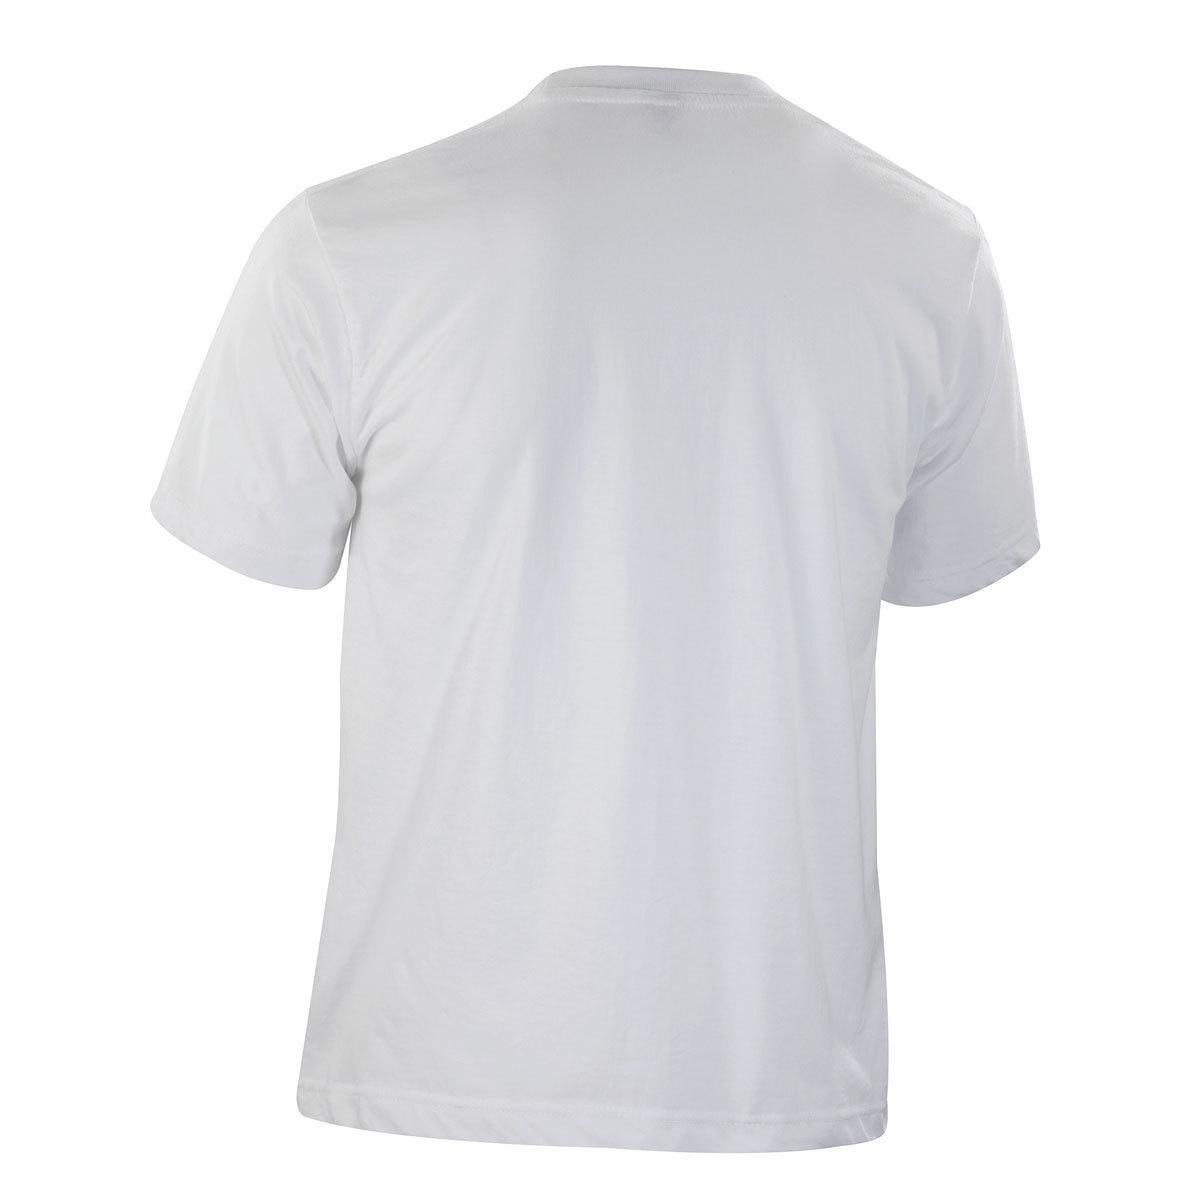 Мужская футболка Asics Promozionali white (T207Z9 0001)фото